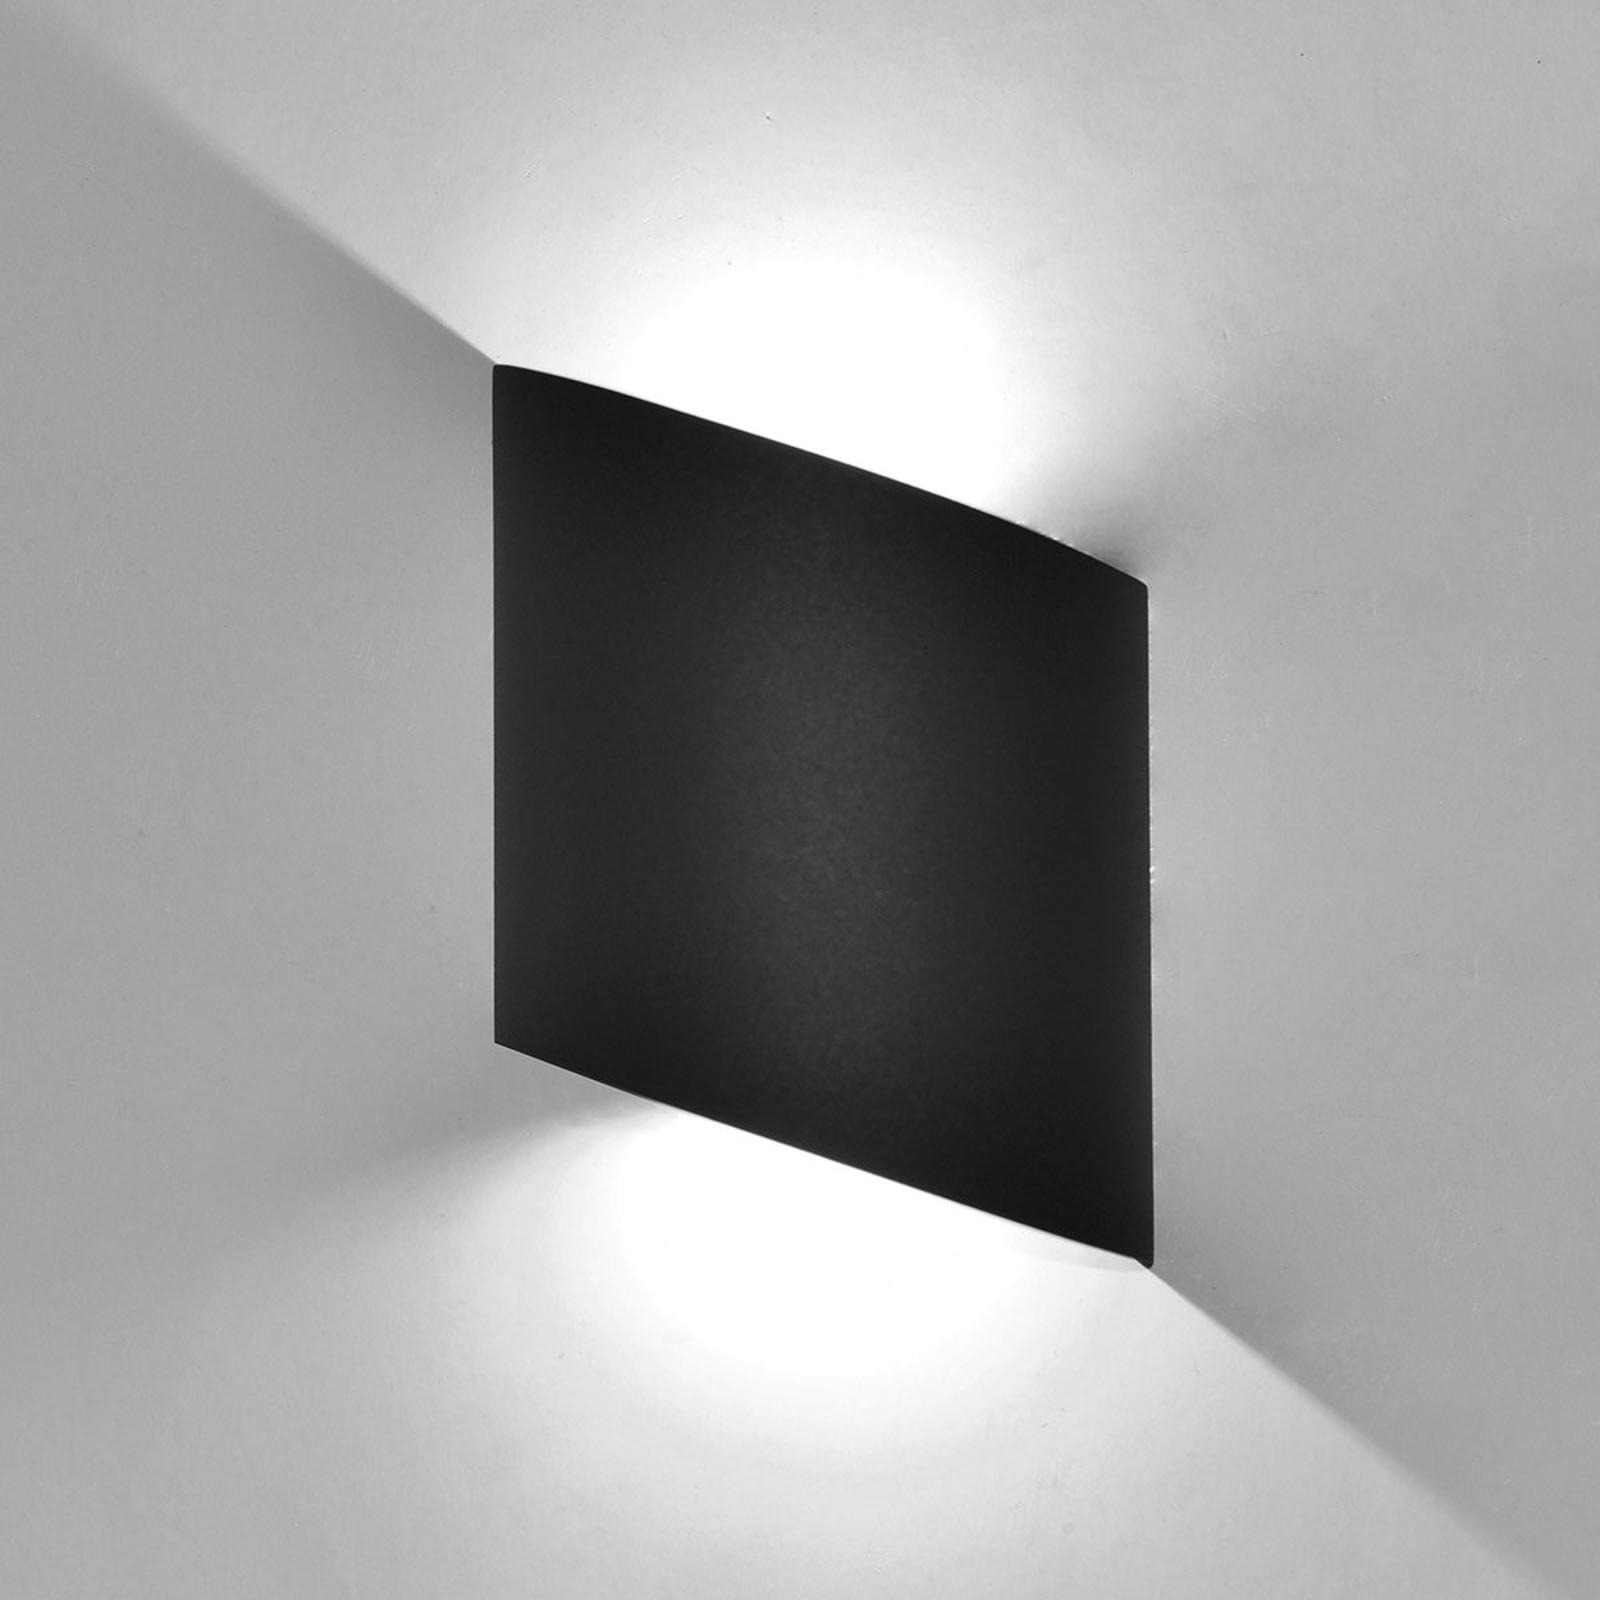 LED-Außenwandlampe Sochi in Dunkelgrau